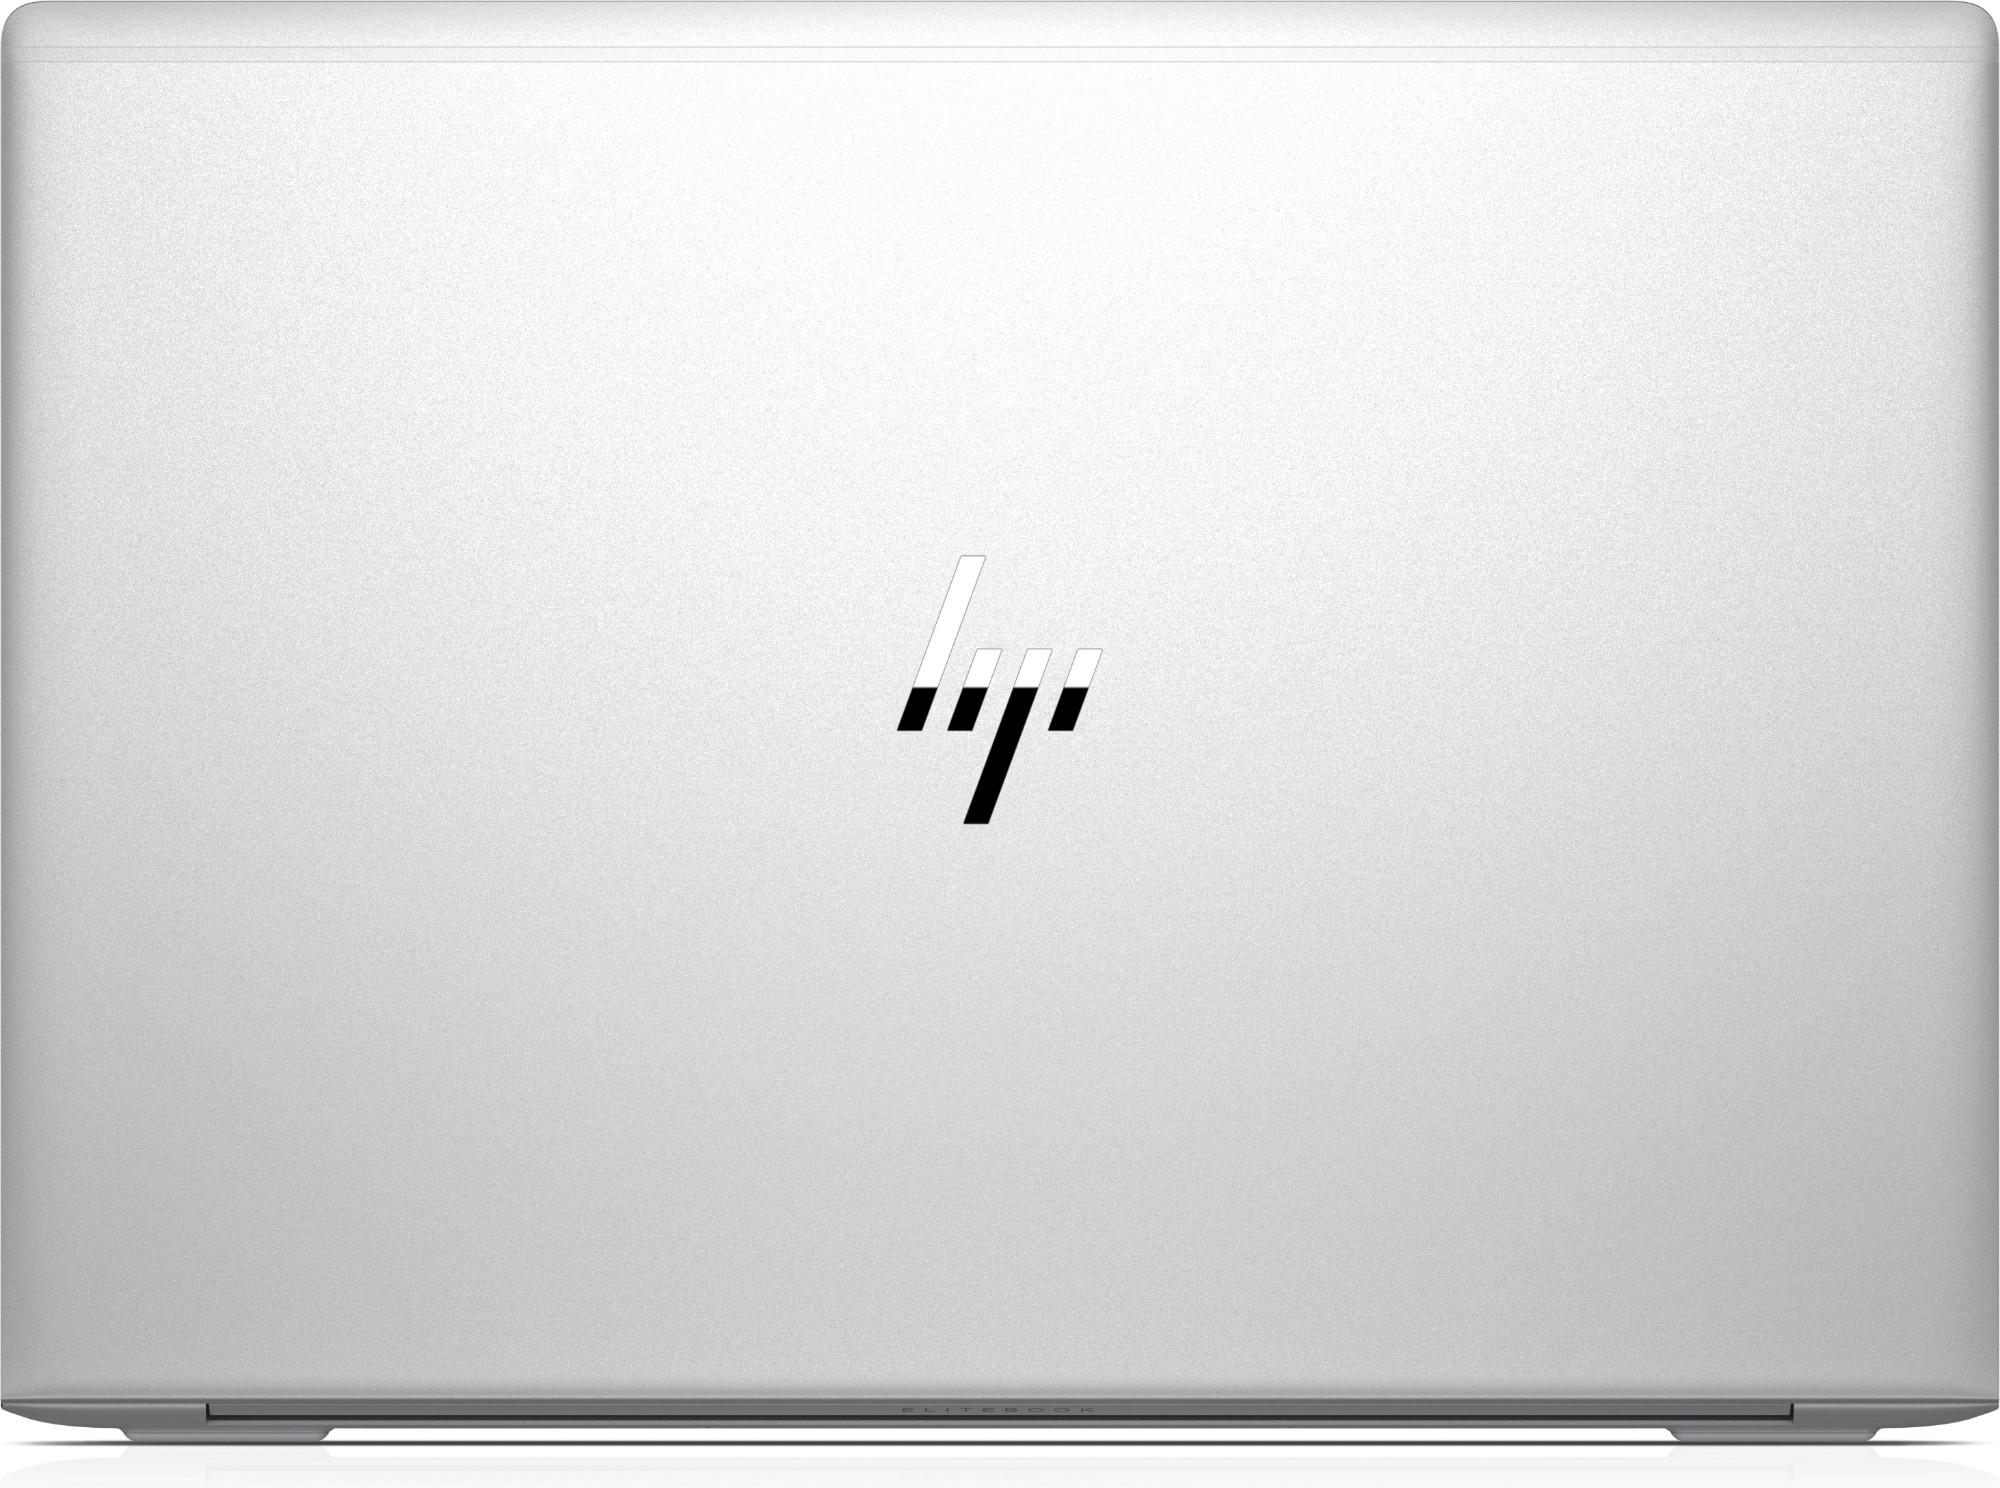 "HP EliteBook 1040 G4 Silver Notebook 35.6 cm (14"") 1920 x 1080 pixels 2.8 GHz 7th gen Intel® Core™ i7 i7-7600U"